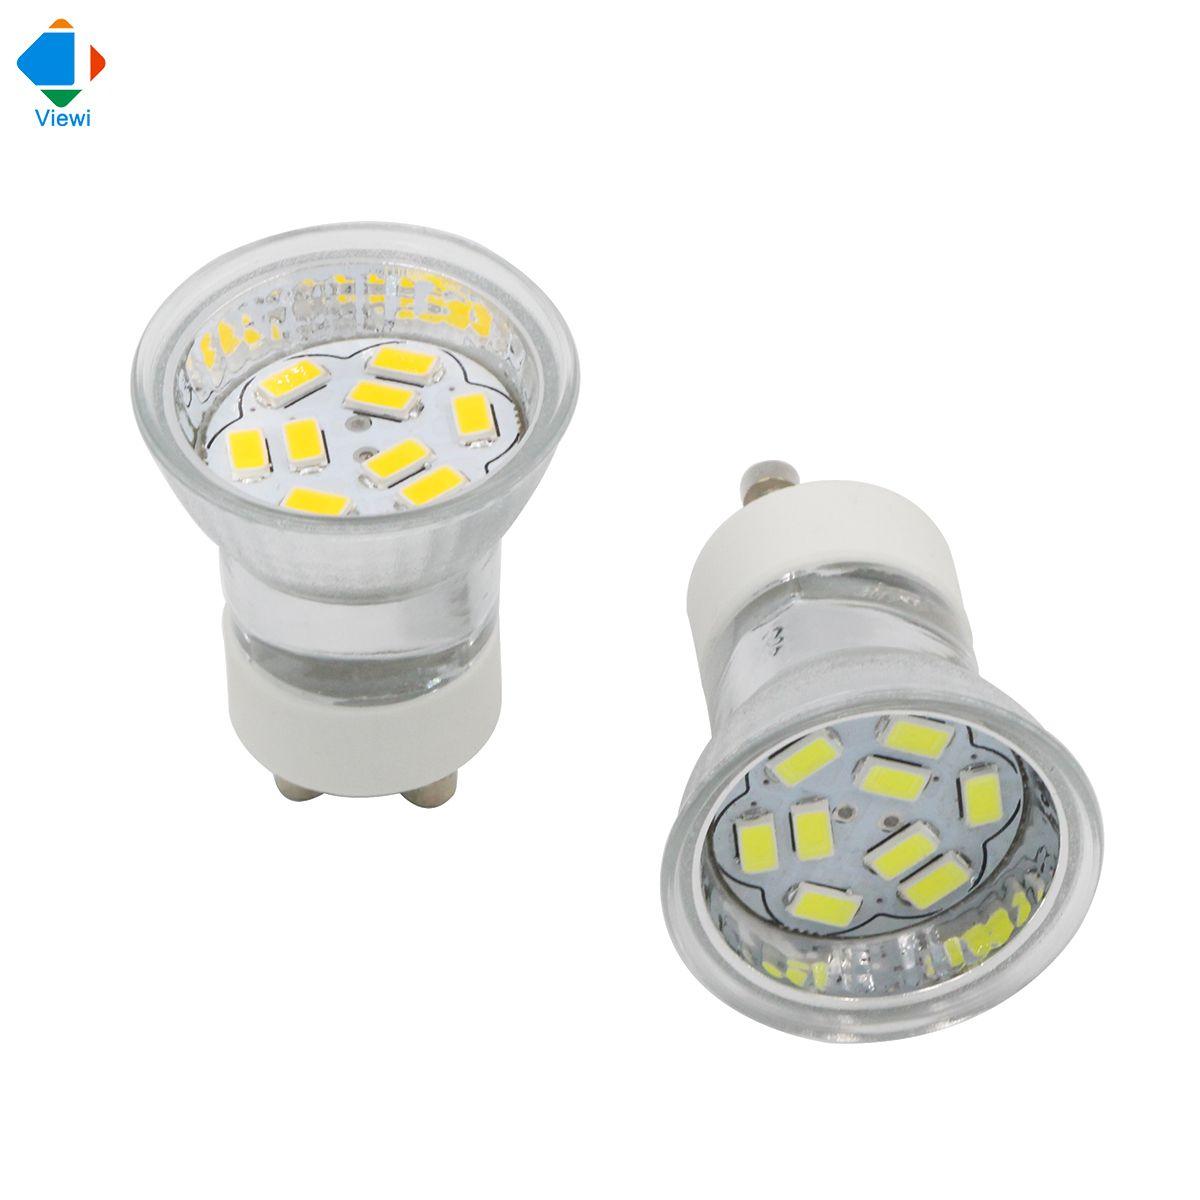 Großhandel 5x 12v Led Spotlight Gu10 Glühbirne Lampe Licht 12 Volt ...